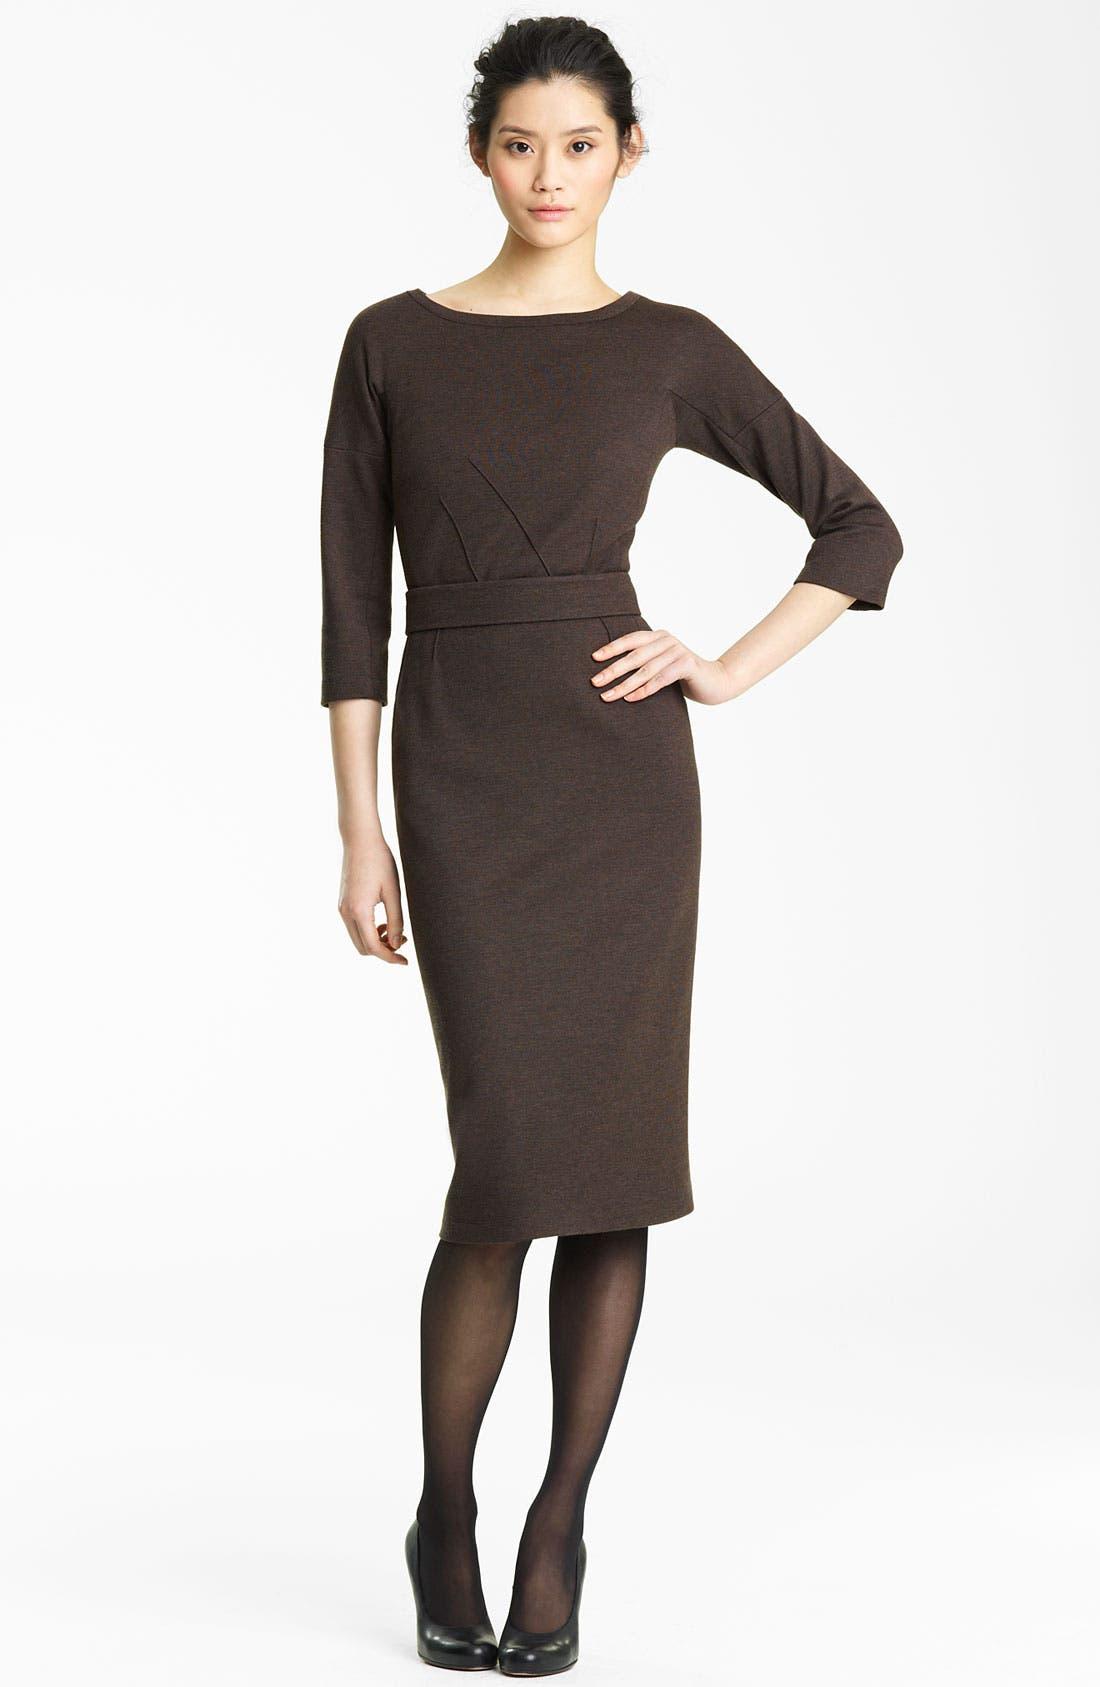 Main Image - Lida Baday Double Knit Wool Dress